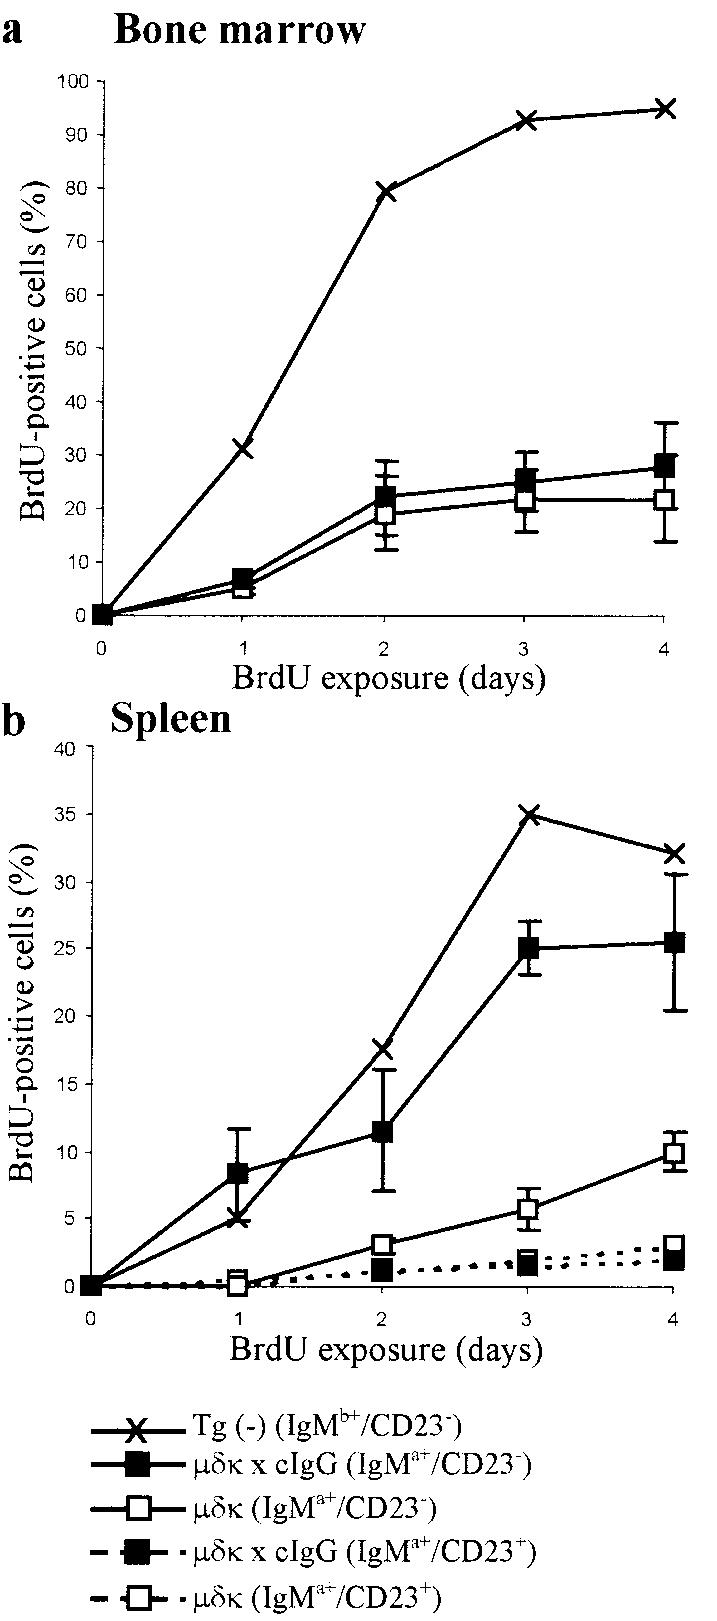 medium resolution of kinetics of brdu labeling of b lymphocytes of naab cigg mice in bone marrow a